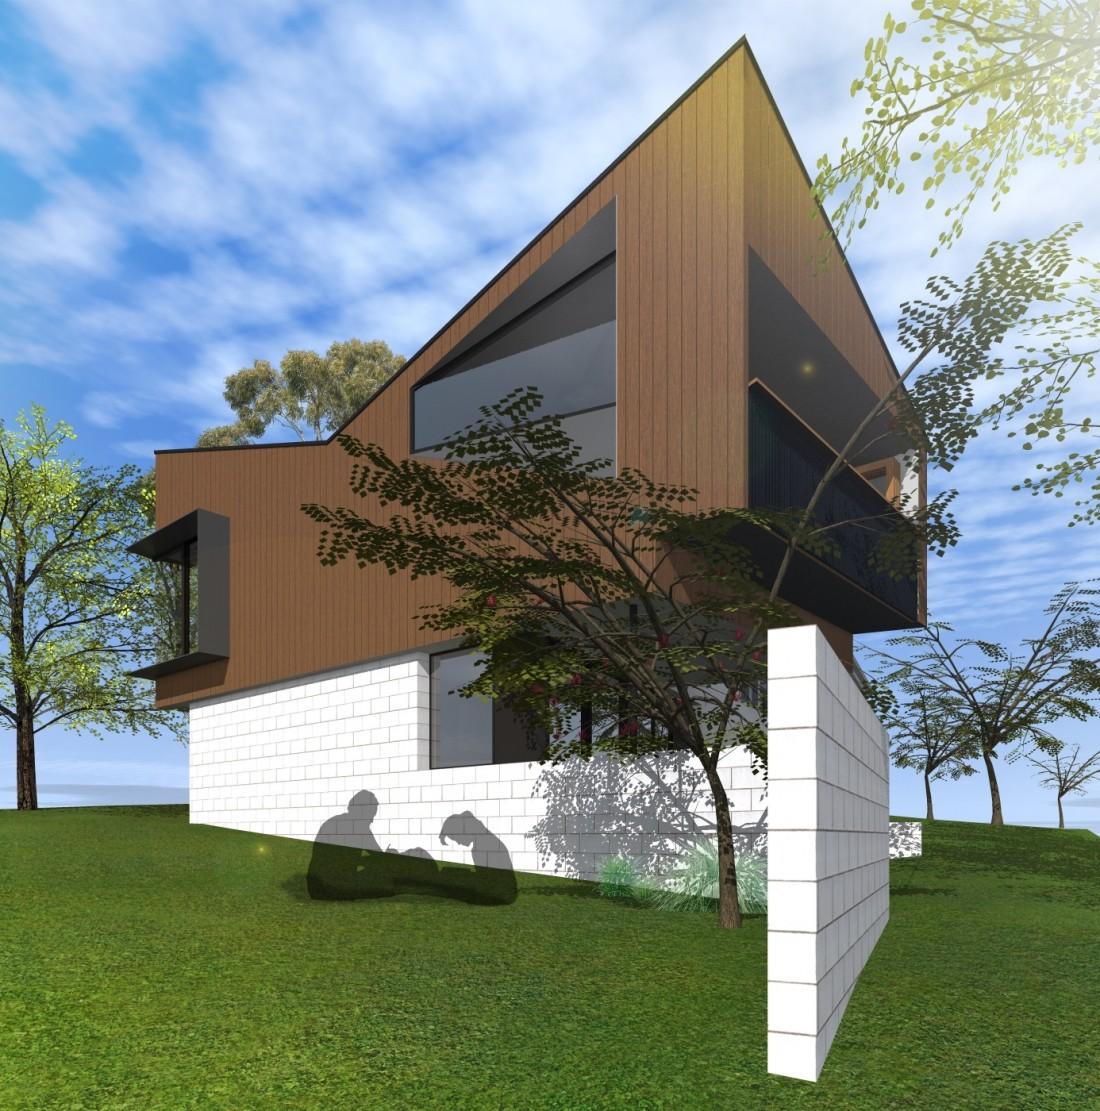 NL house - Reddog Award Winning Architects Brisbane